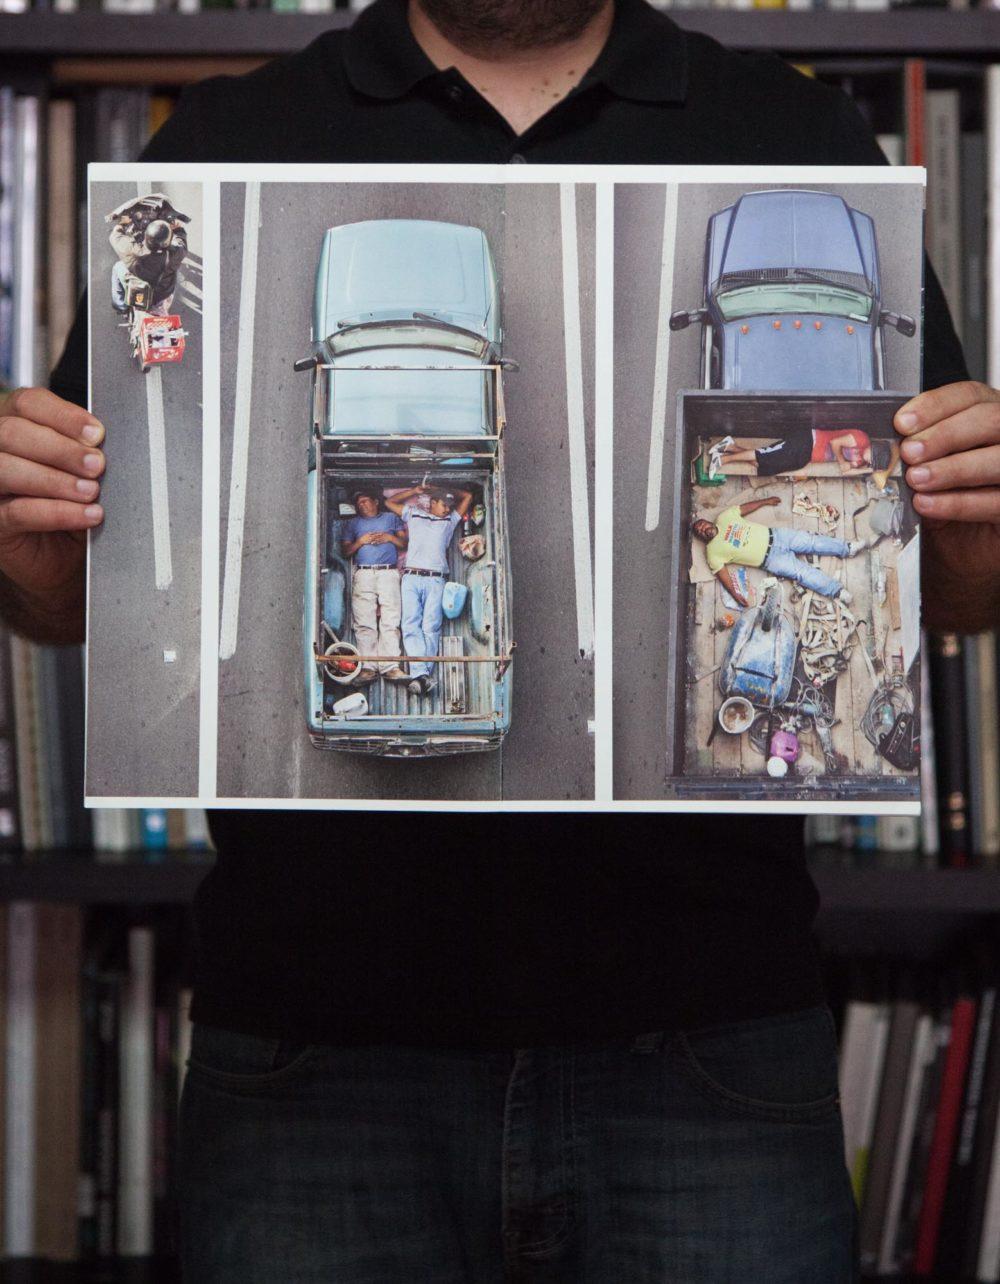 Carpoolers 1st Edition Book by Alejandro Cartagena, Published 2014 by Studio Cartagena